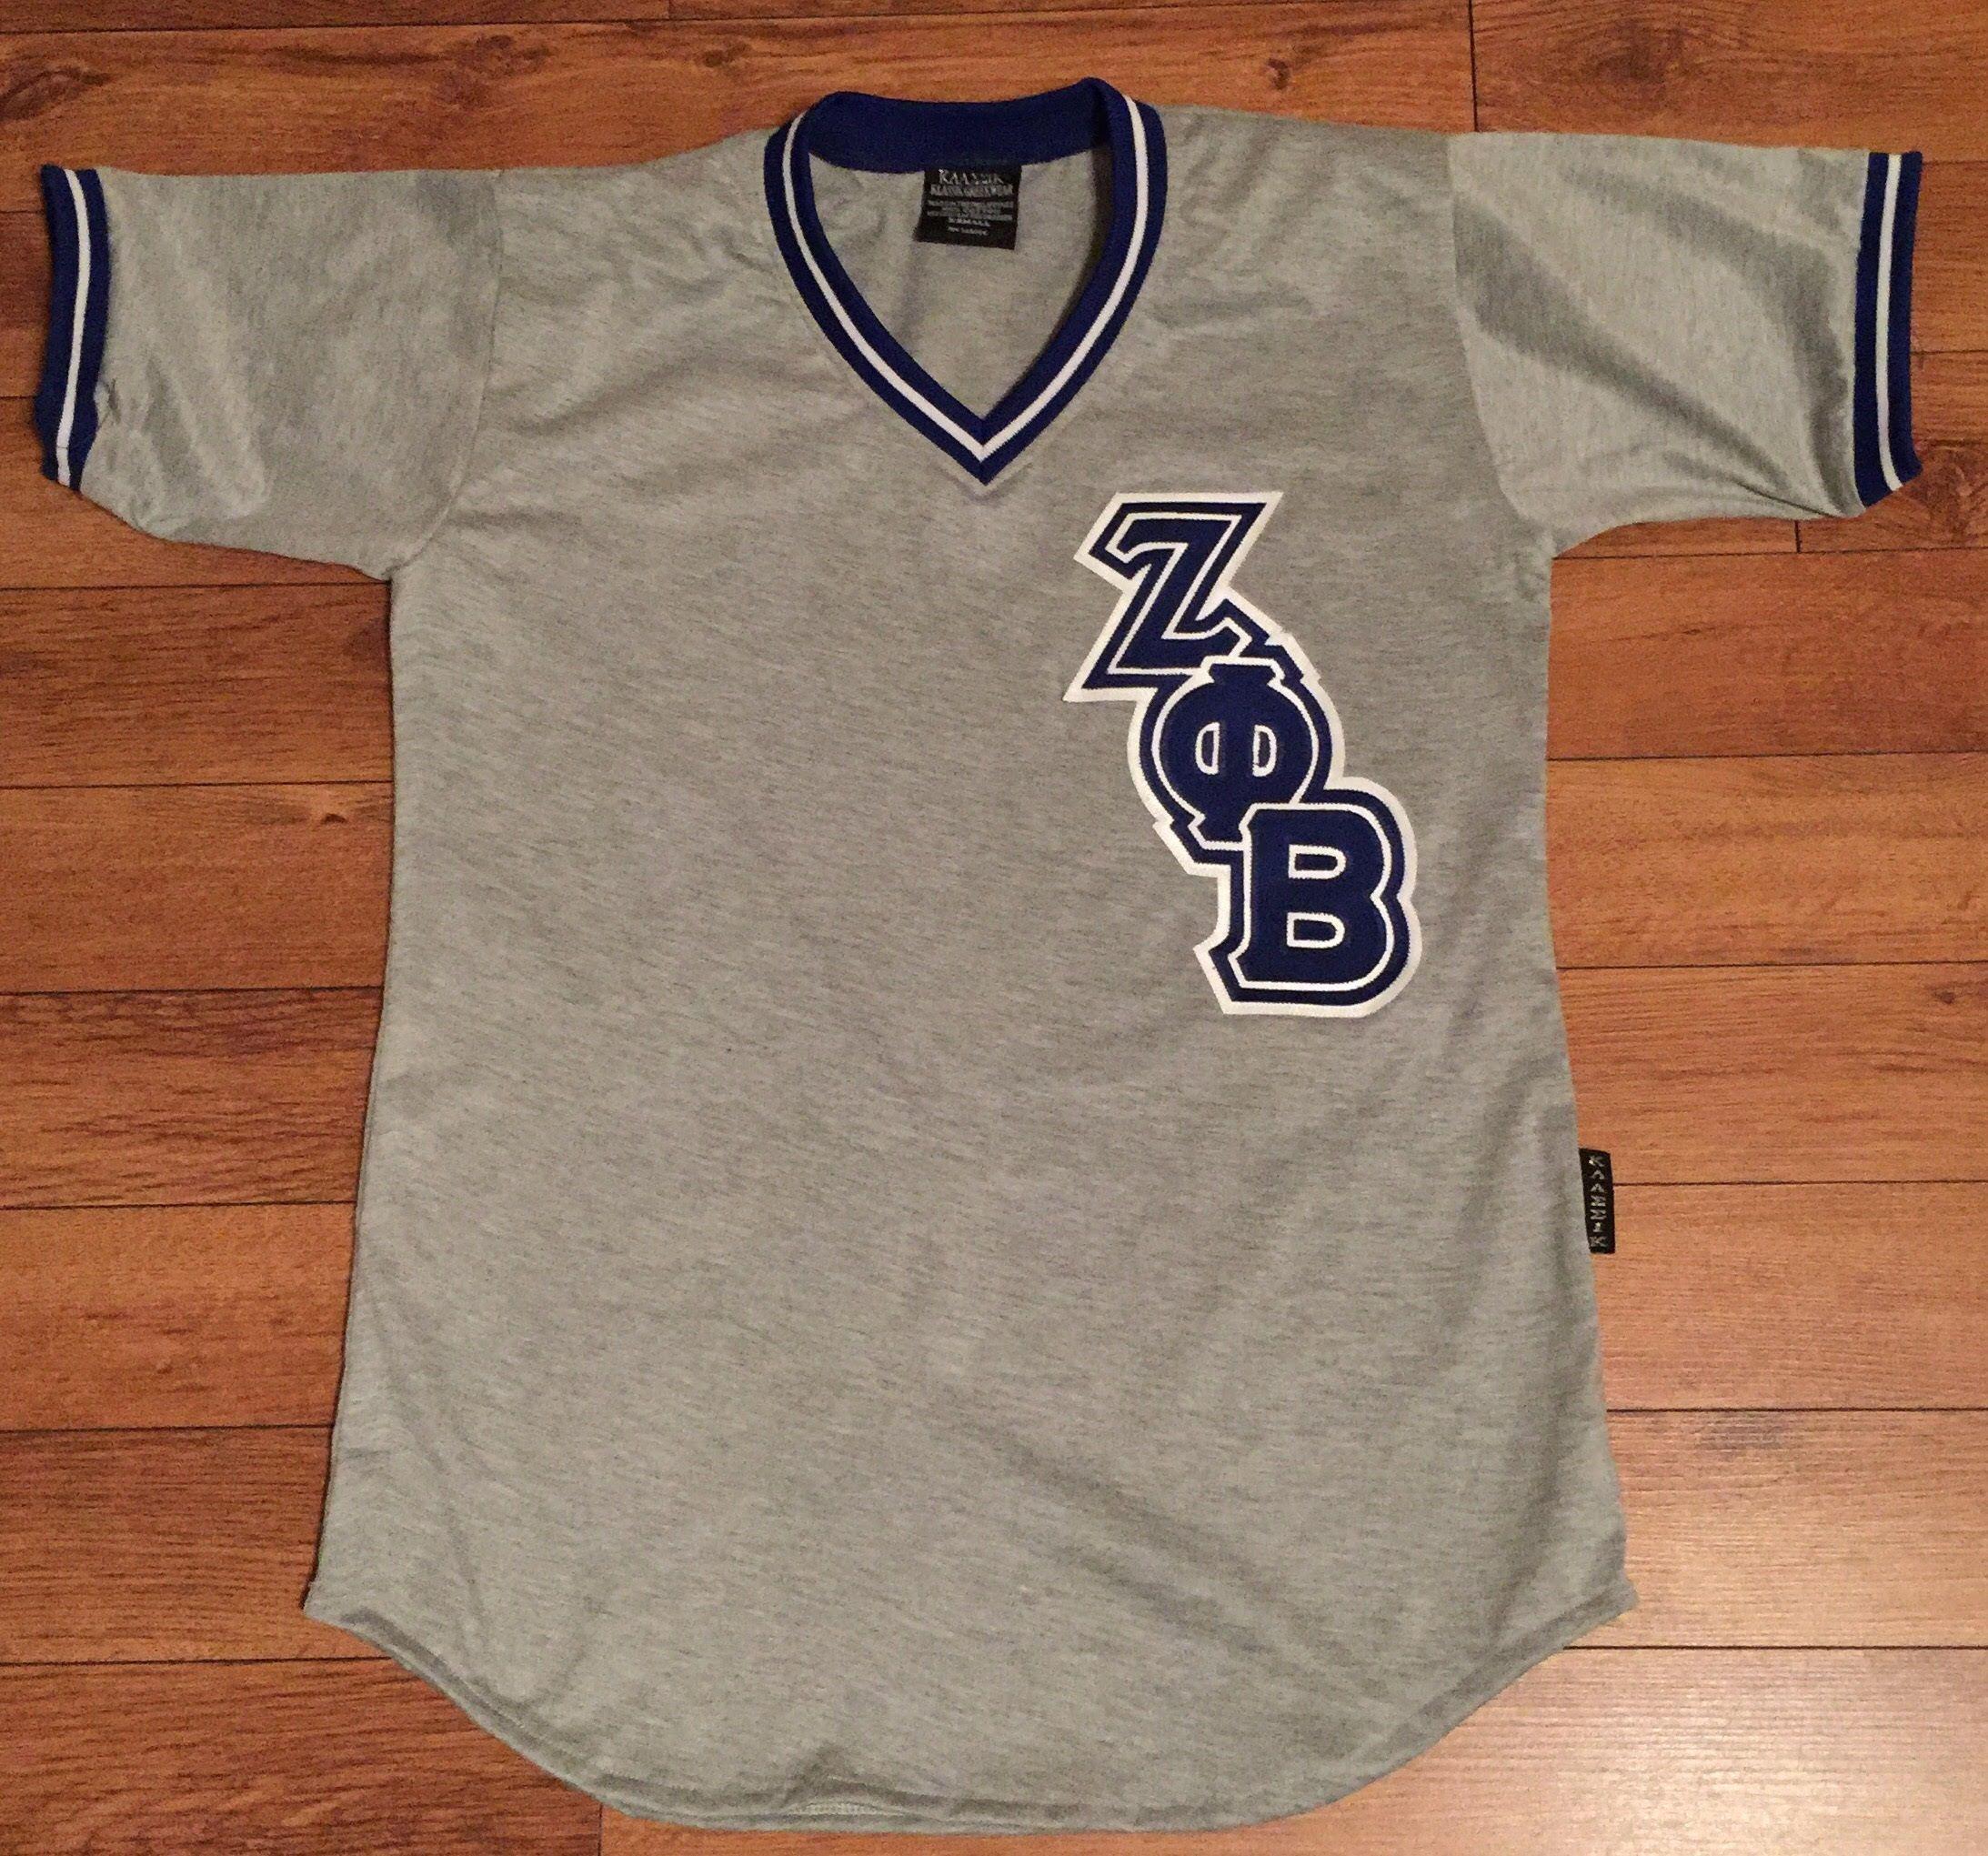 Zetaphibeta Retro Baseball Jersey Reflective Klassik Greekwear Zeta Phi Beta Reflective Mens Tops